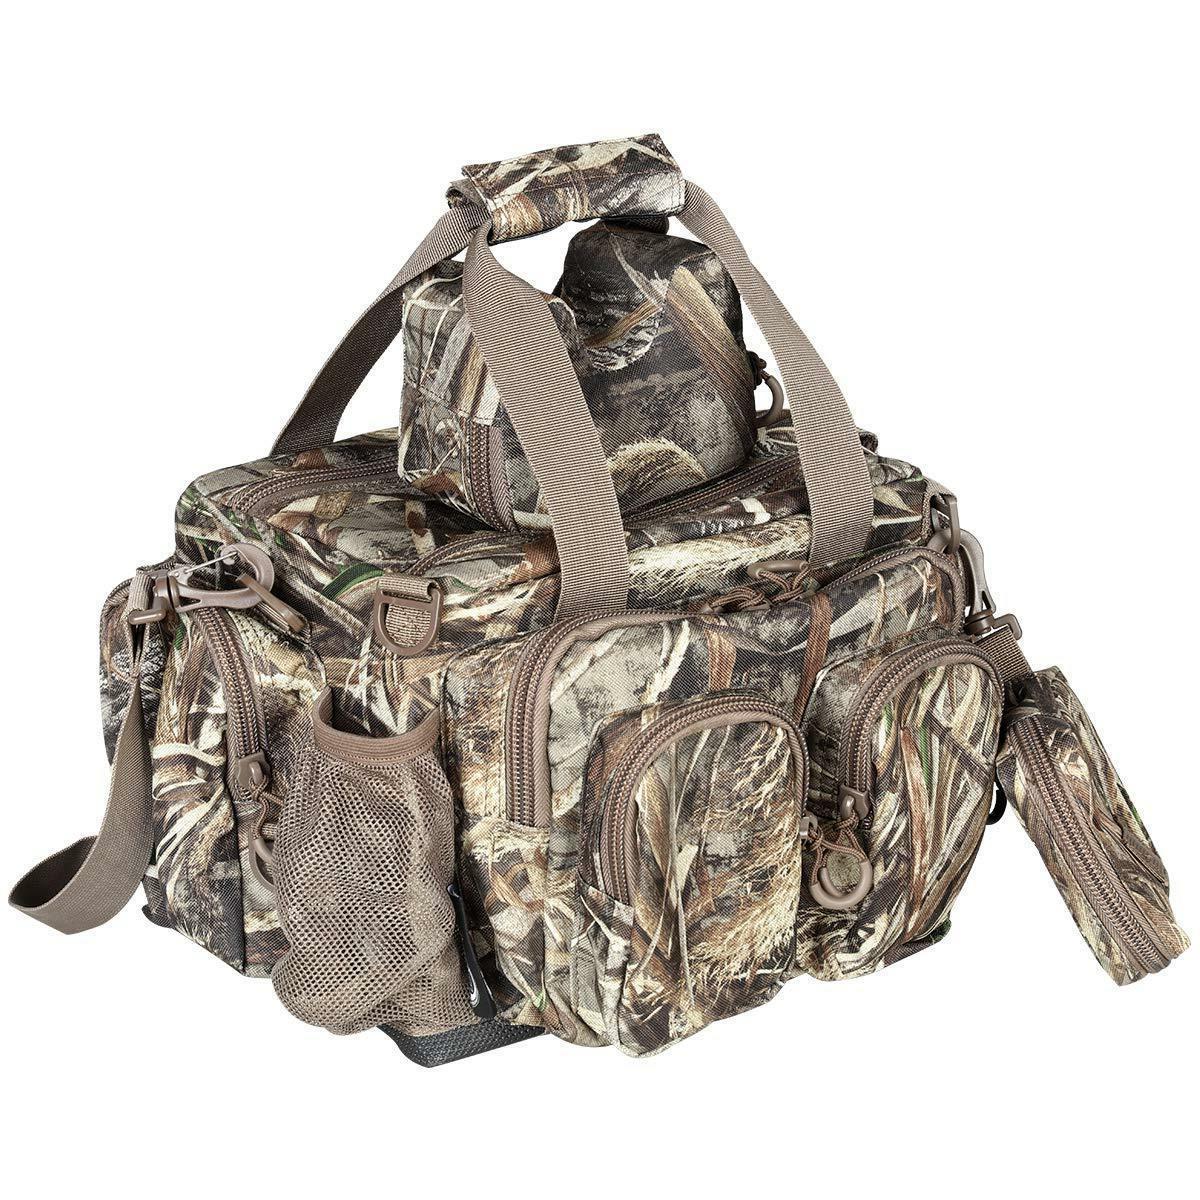 waterfowl hunting gear catch all range bag